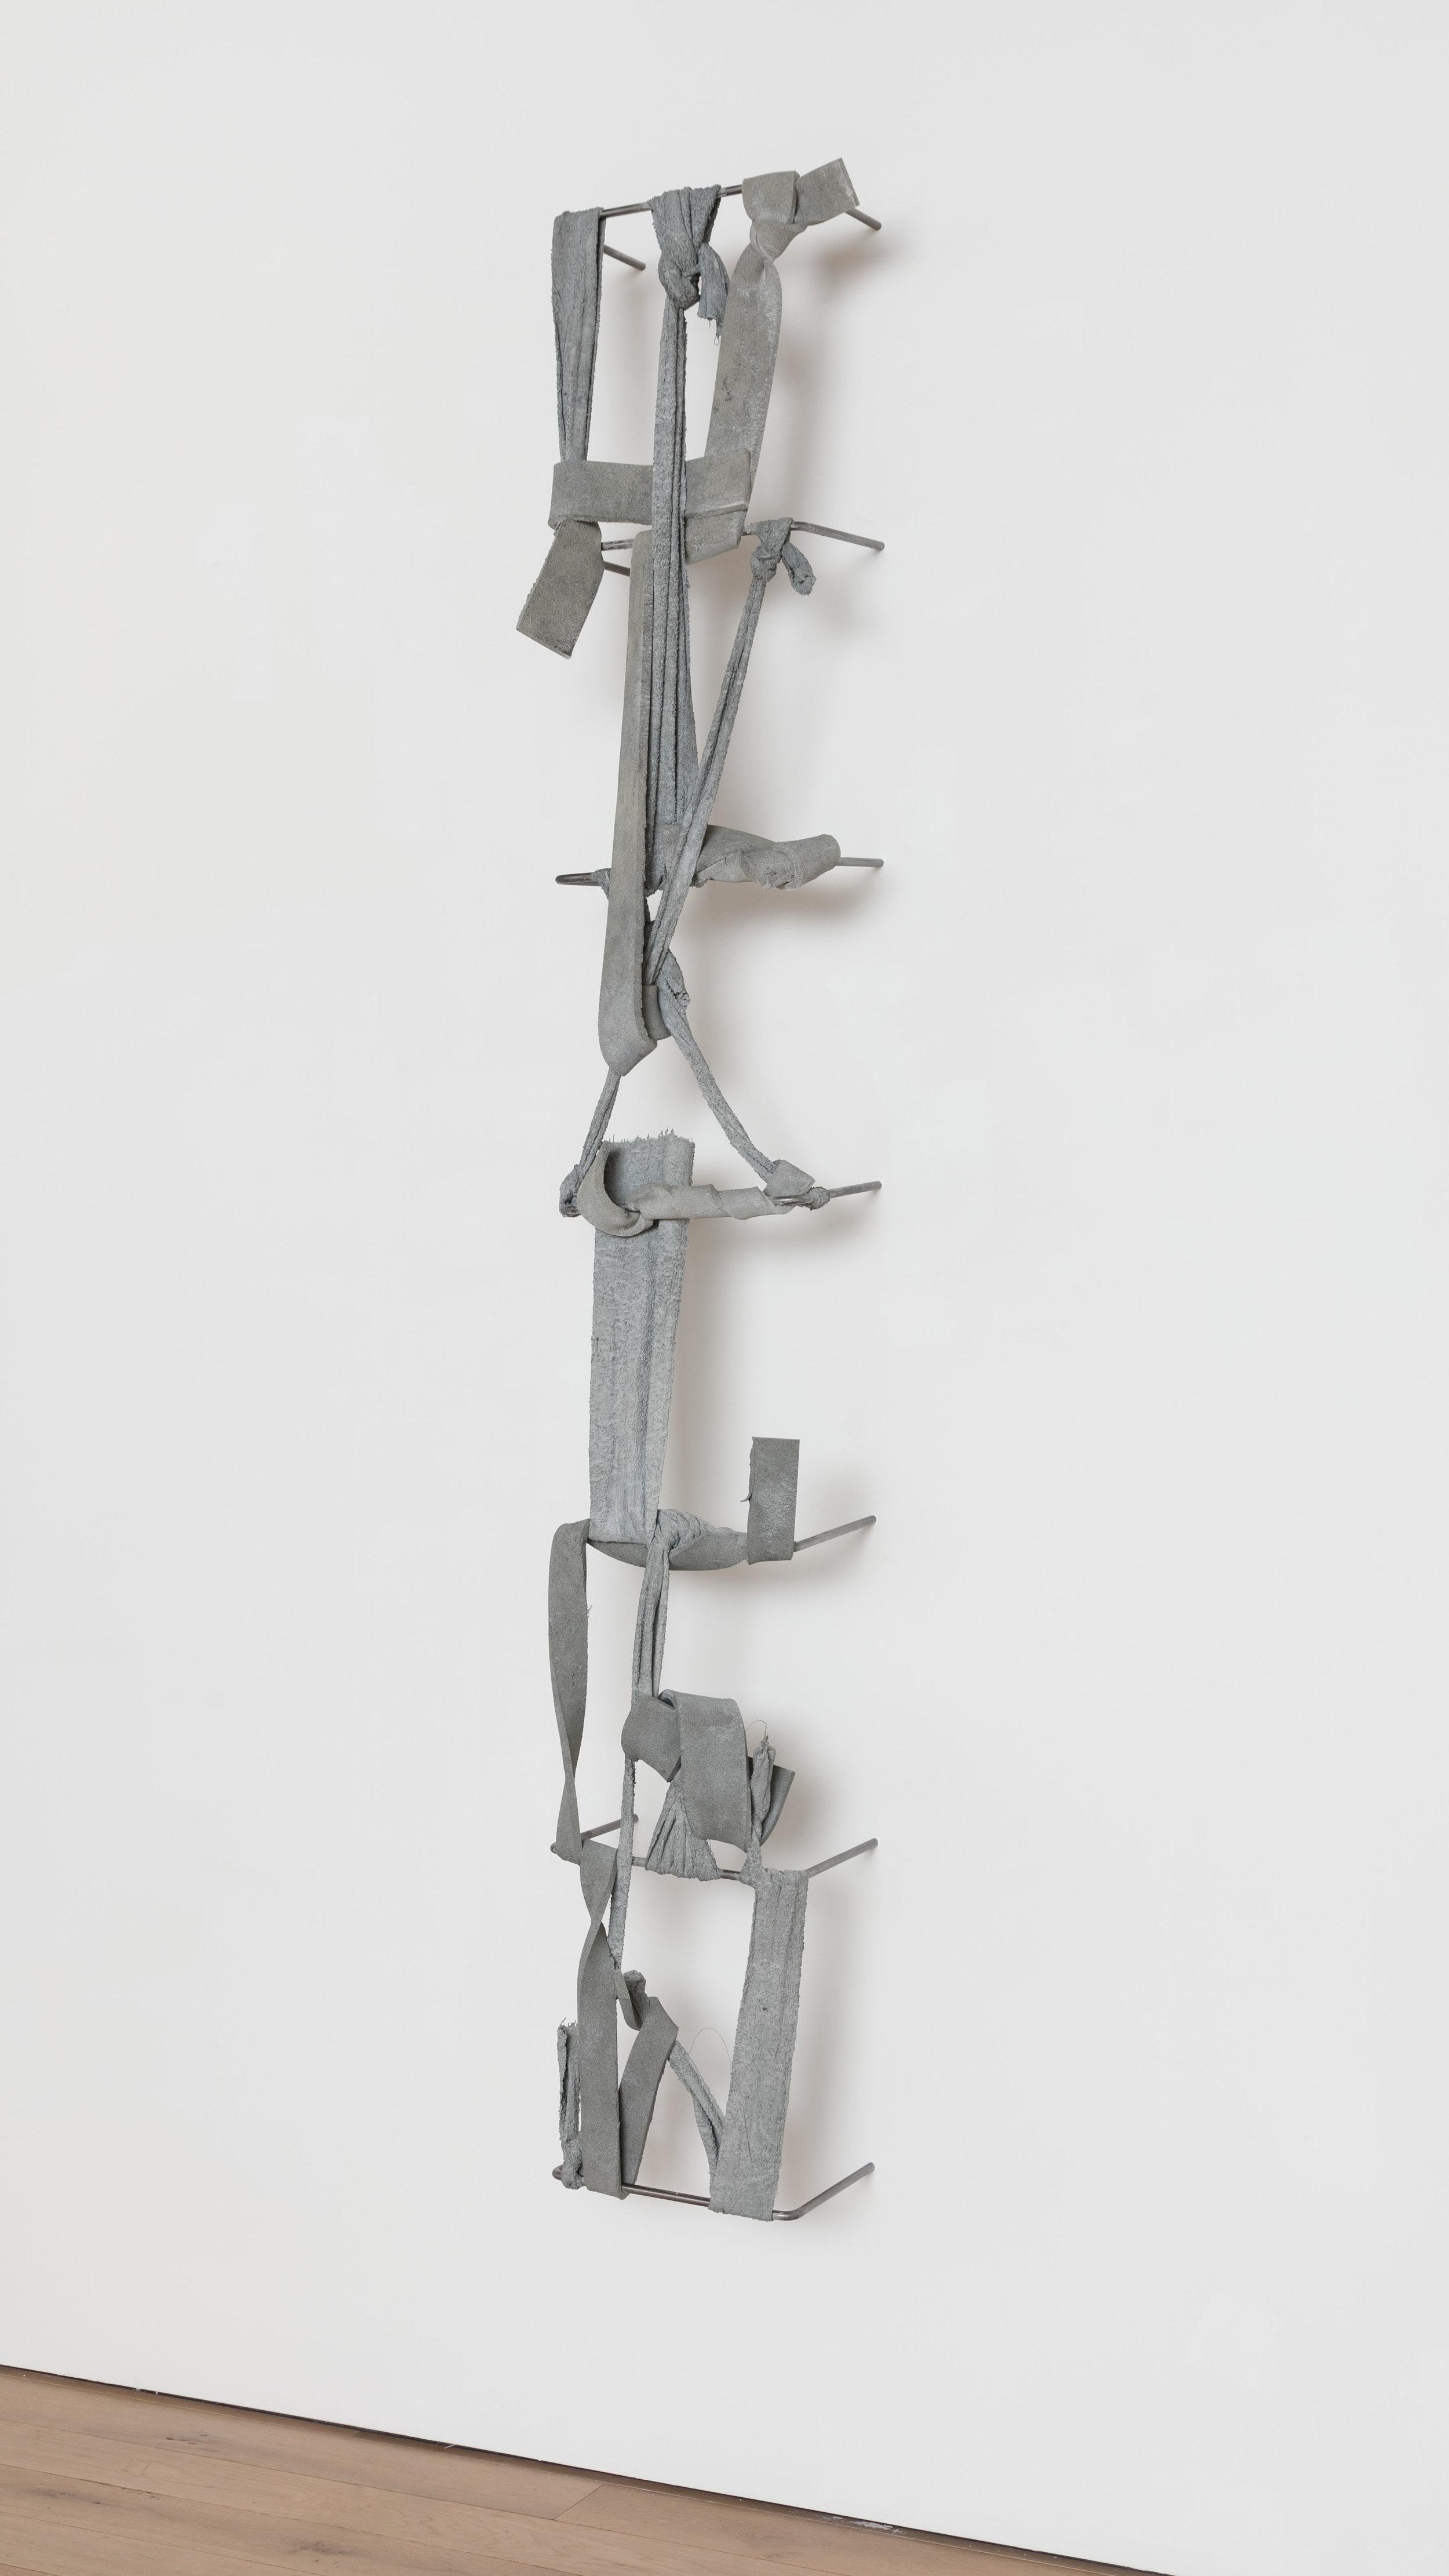 Nikita Gale,  FIXED LOOP V-VI , 2018, concrete, polyurethane foam, terrycloth, steel, 114 1/4 × 18 1/2 × 16 in.